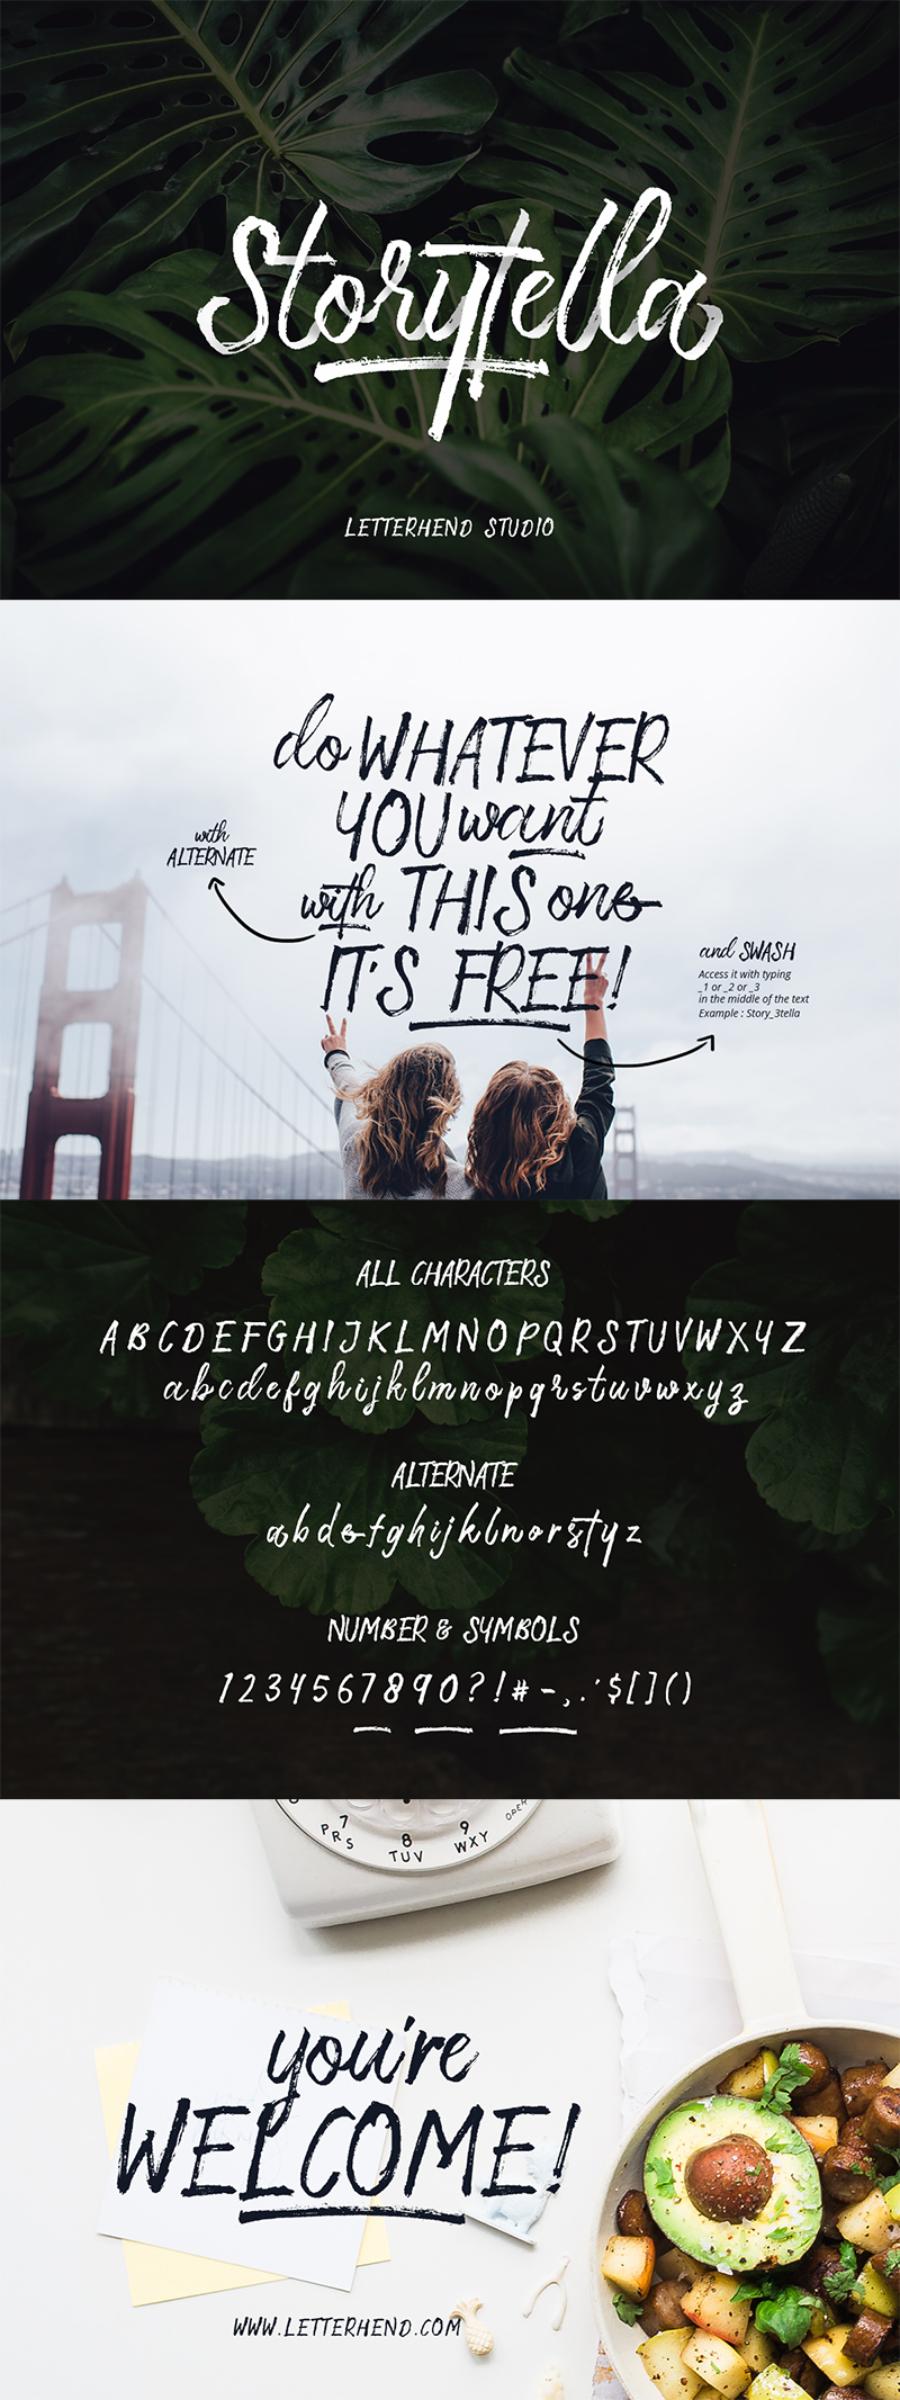 storytella-free-font_letterhend-studio_070817_prev01